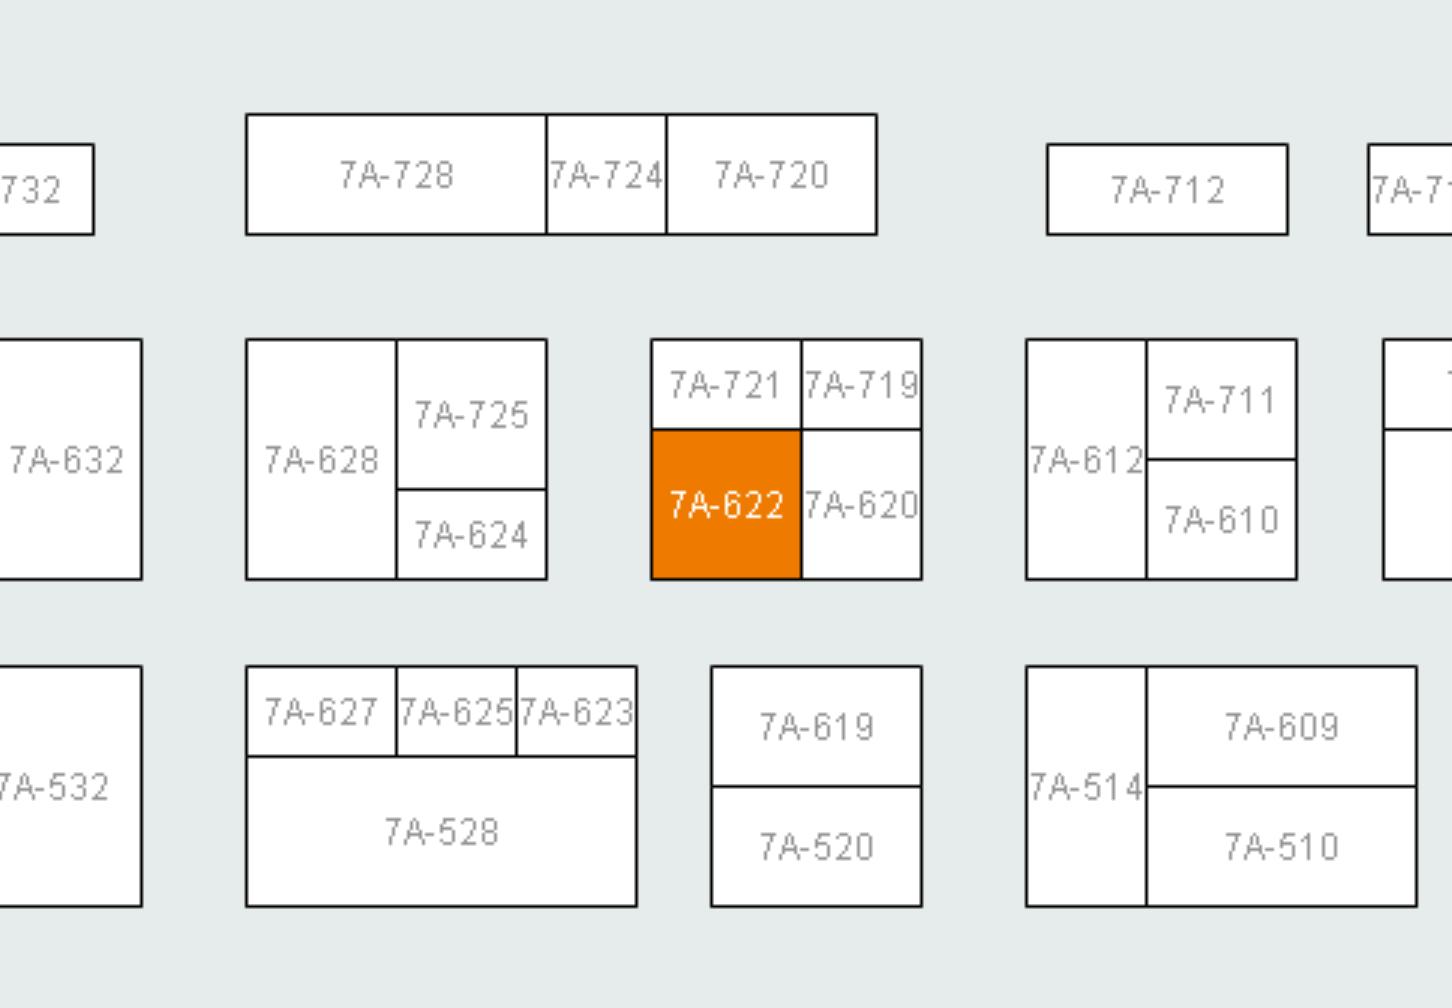 7A / 7A-622